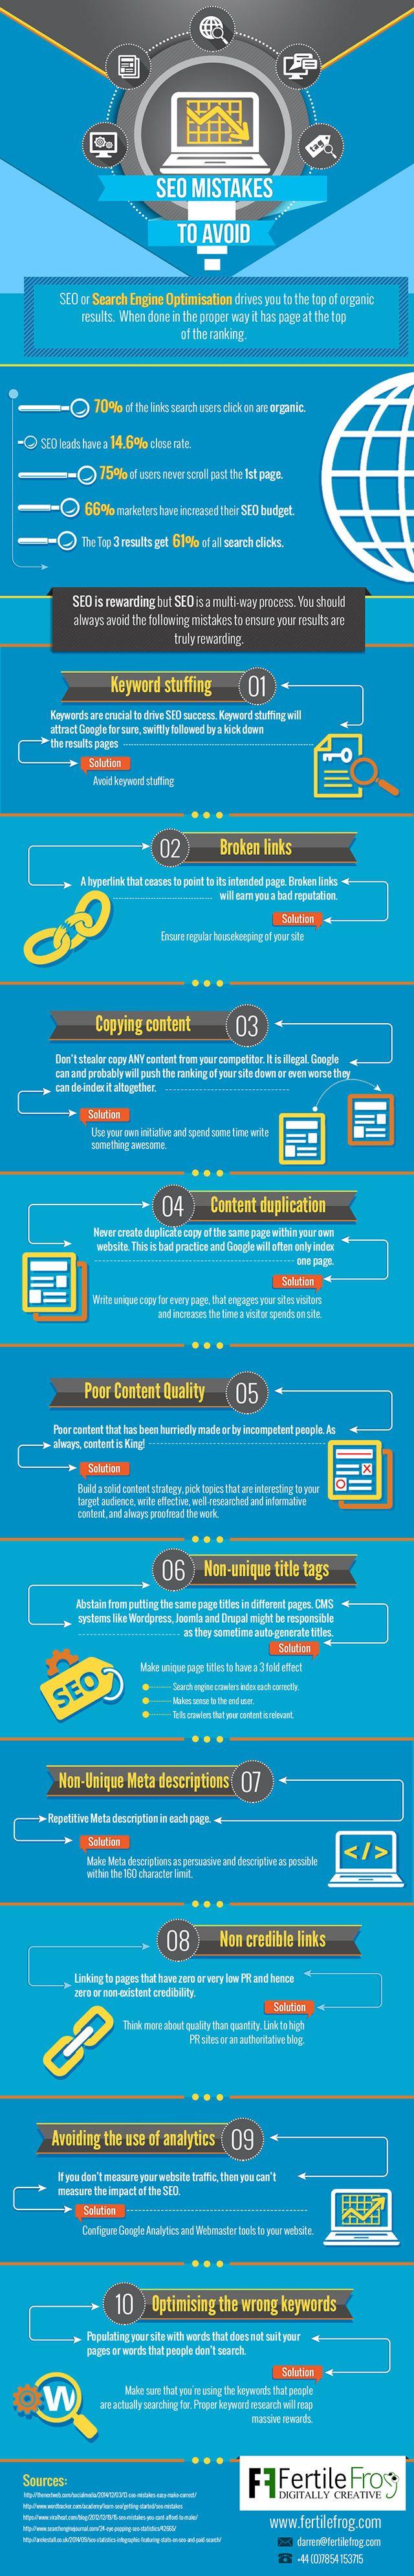 SEO Tactics You Must Stop Right Away. #Infographic #DataViz #DigitalMarketing